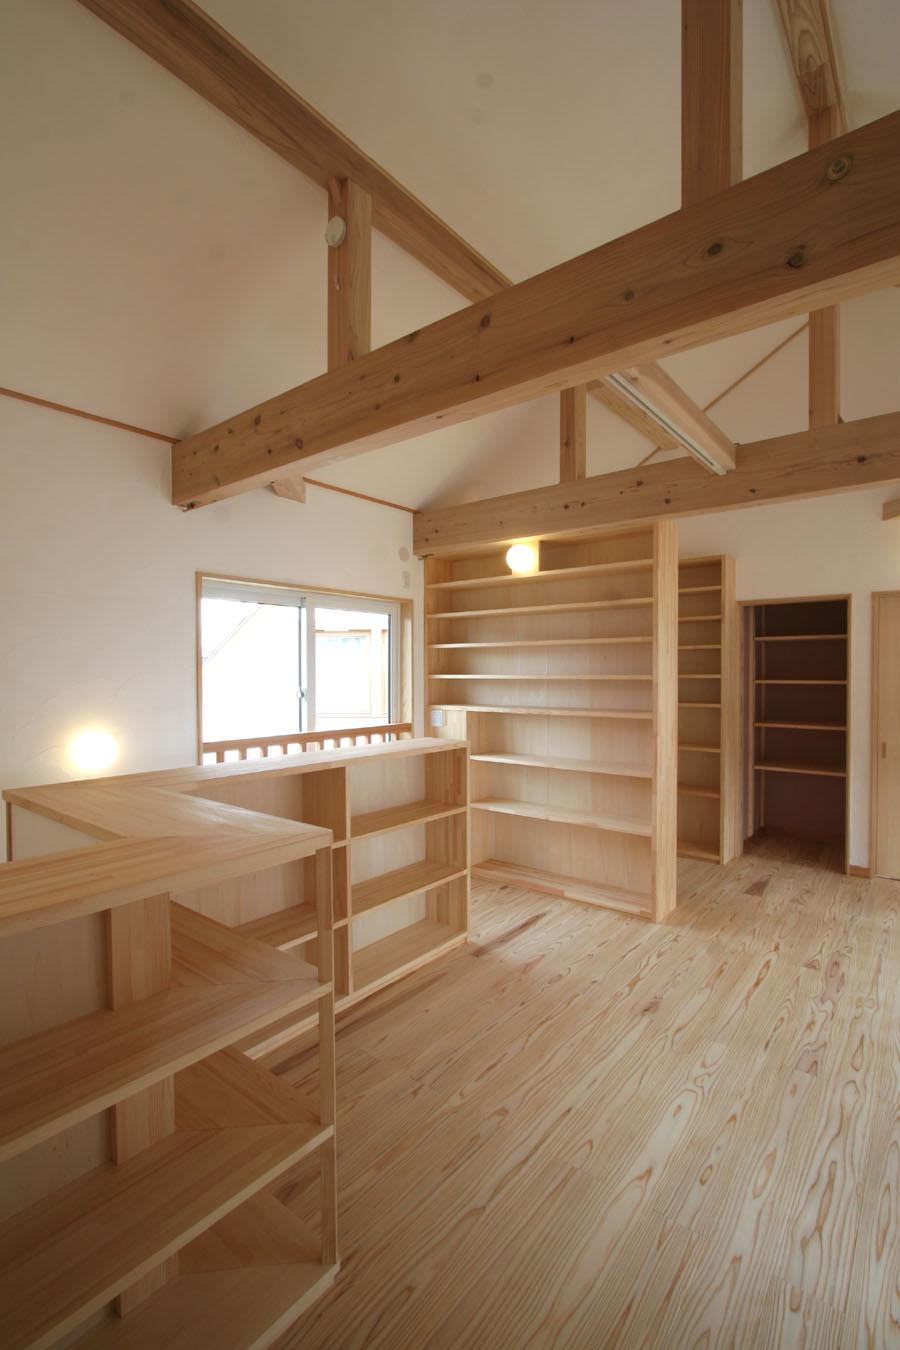 I様邸「新屋松美が丘の家」完成見学会のお礼。_f0150893_13324665.jpg